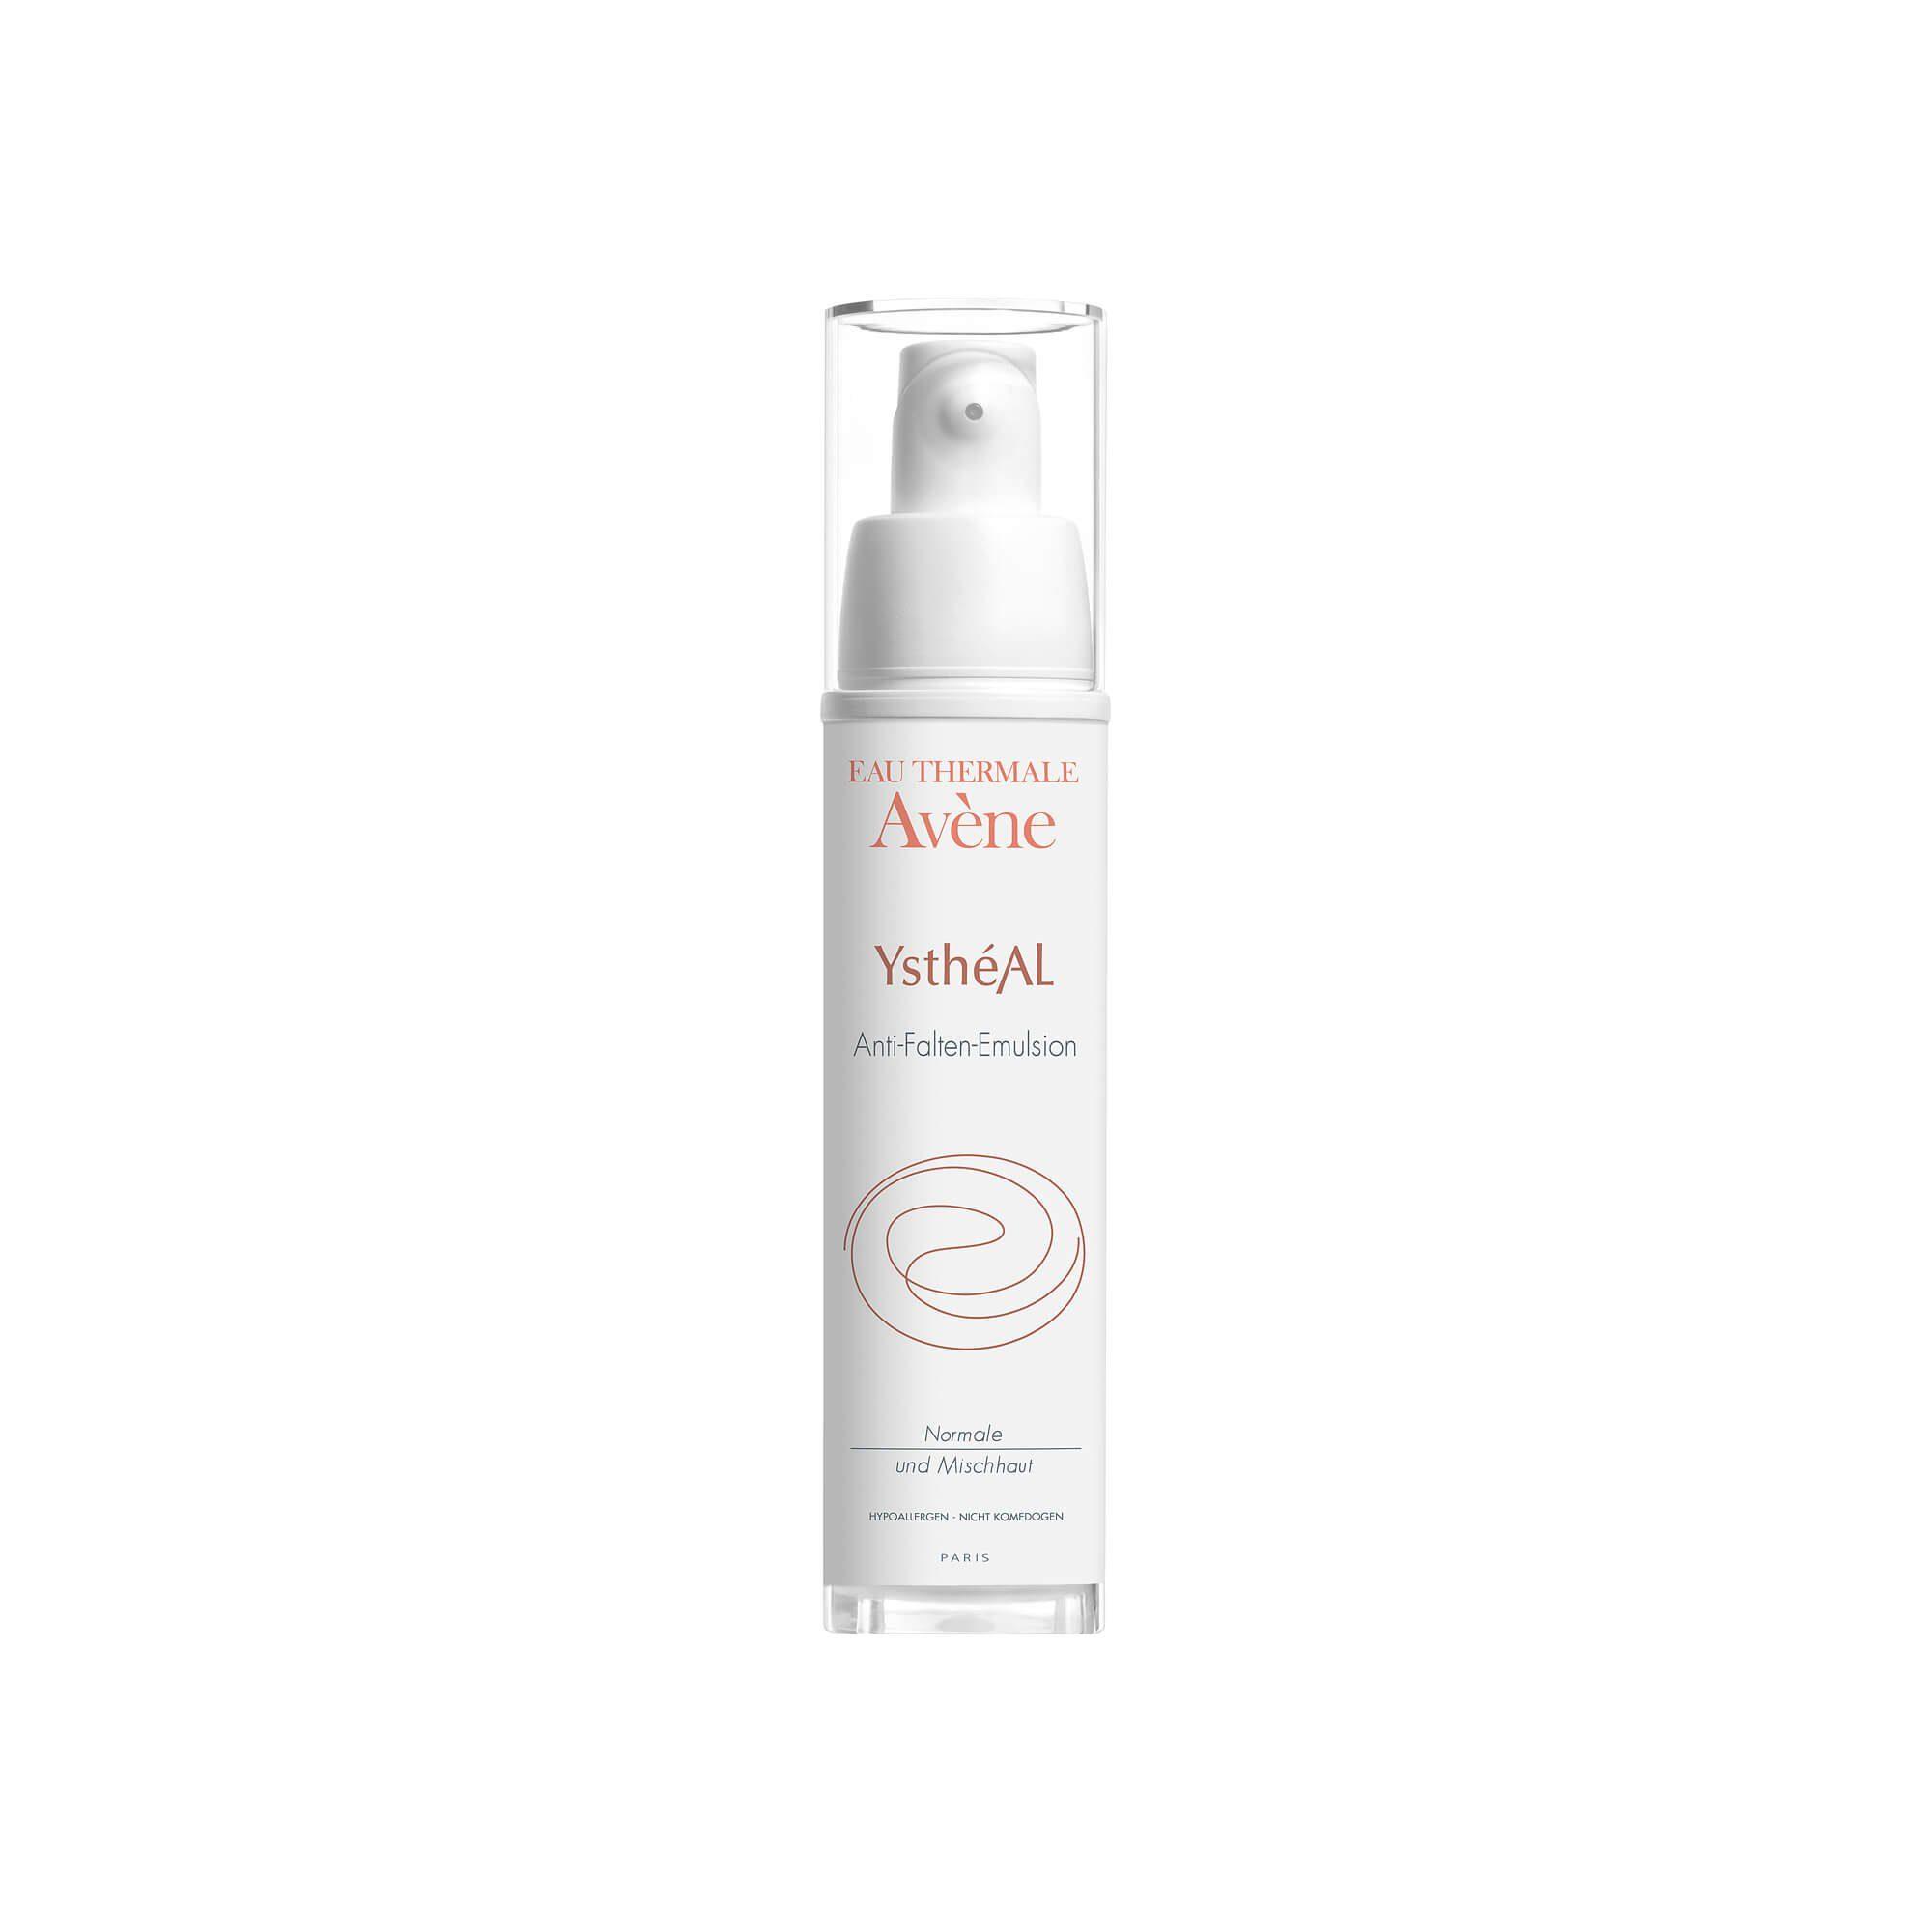 Avene Avene Ystheal Anti-Falten-Emulsion , 30 ml